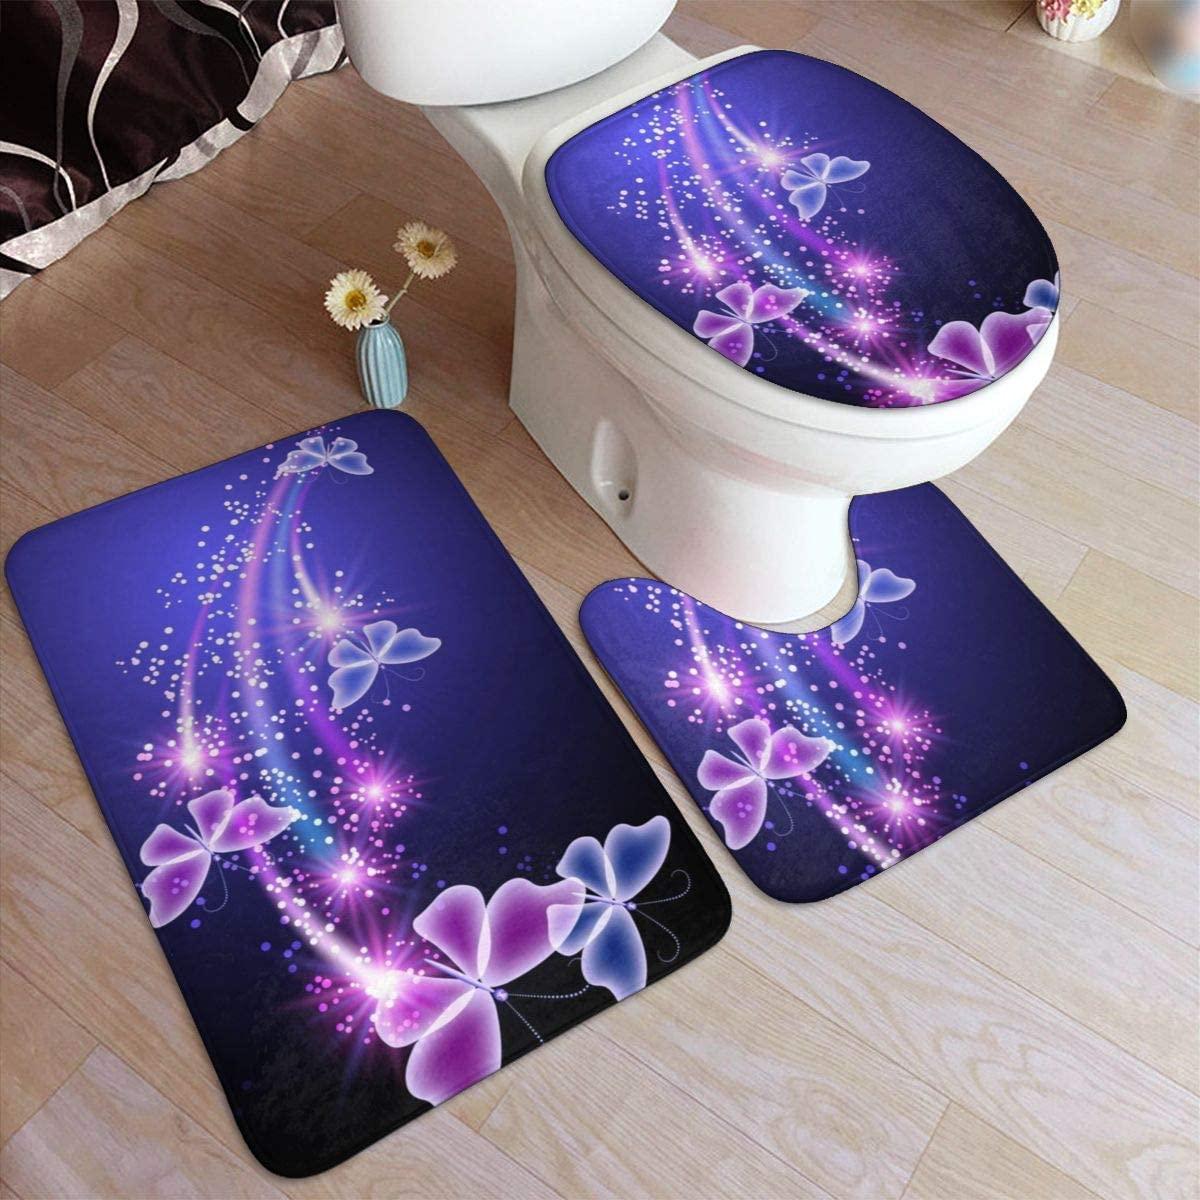 Bath Mat Sets, Butterflies,Contour Rug U-Shaped Toilet Lid Cover,Non Slip,Machine Washable,3-Piece Rug Set Easier to Dry for Bathroom